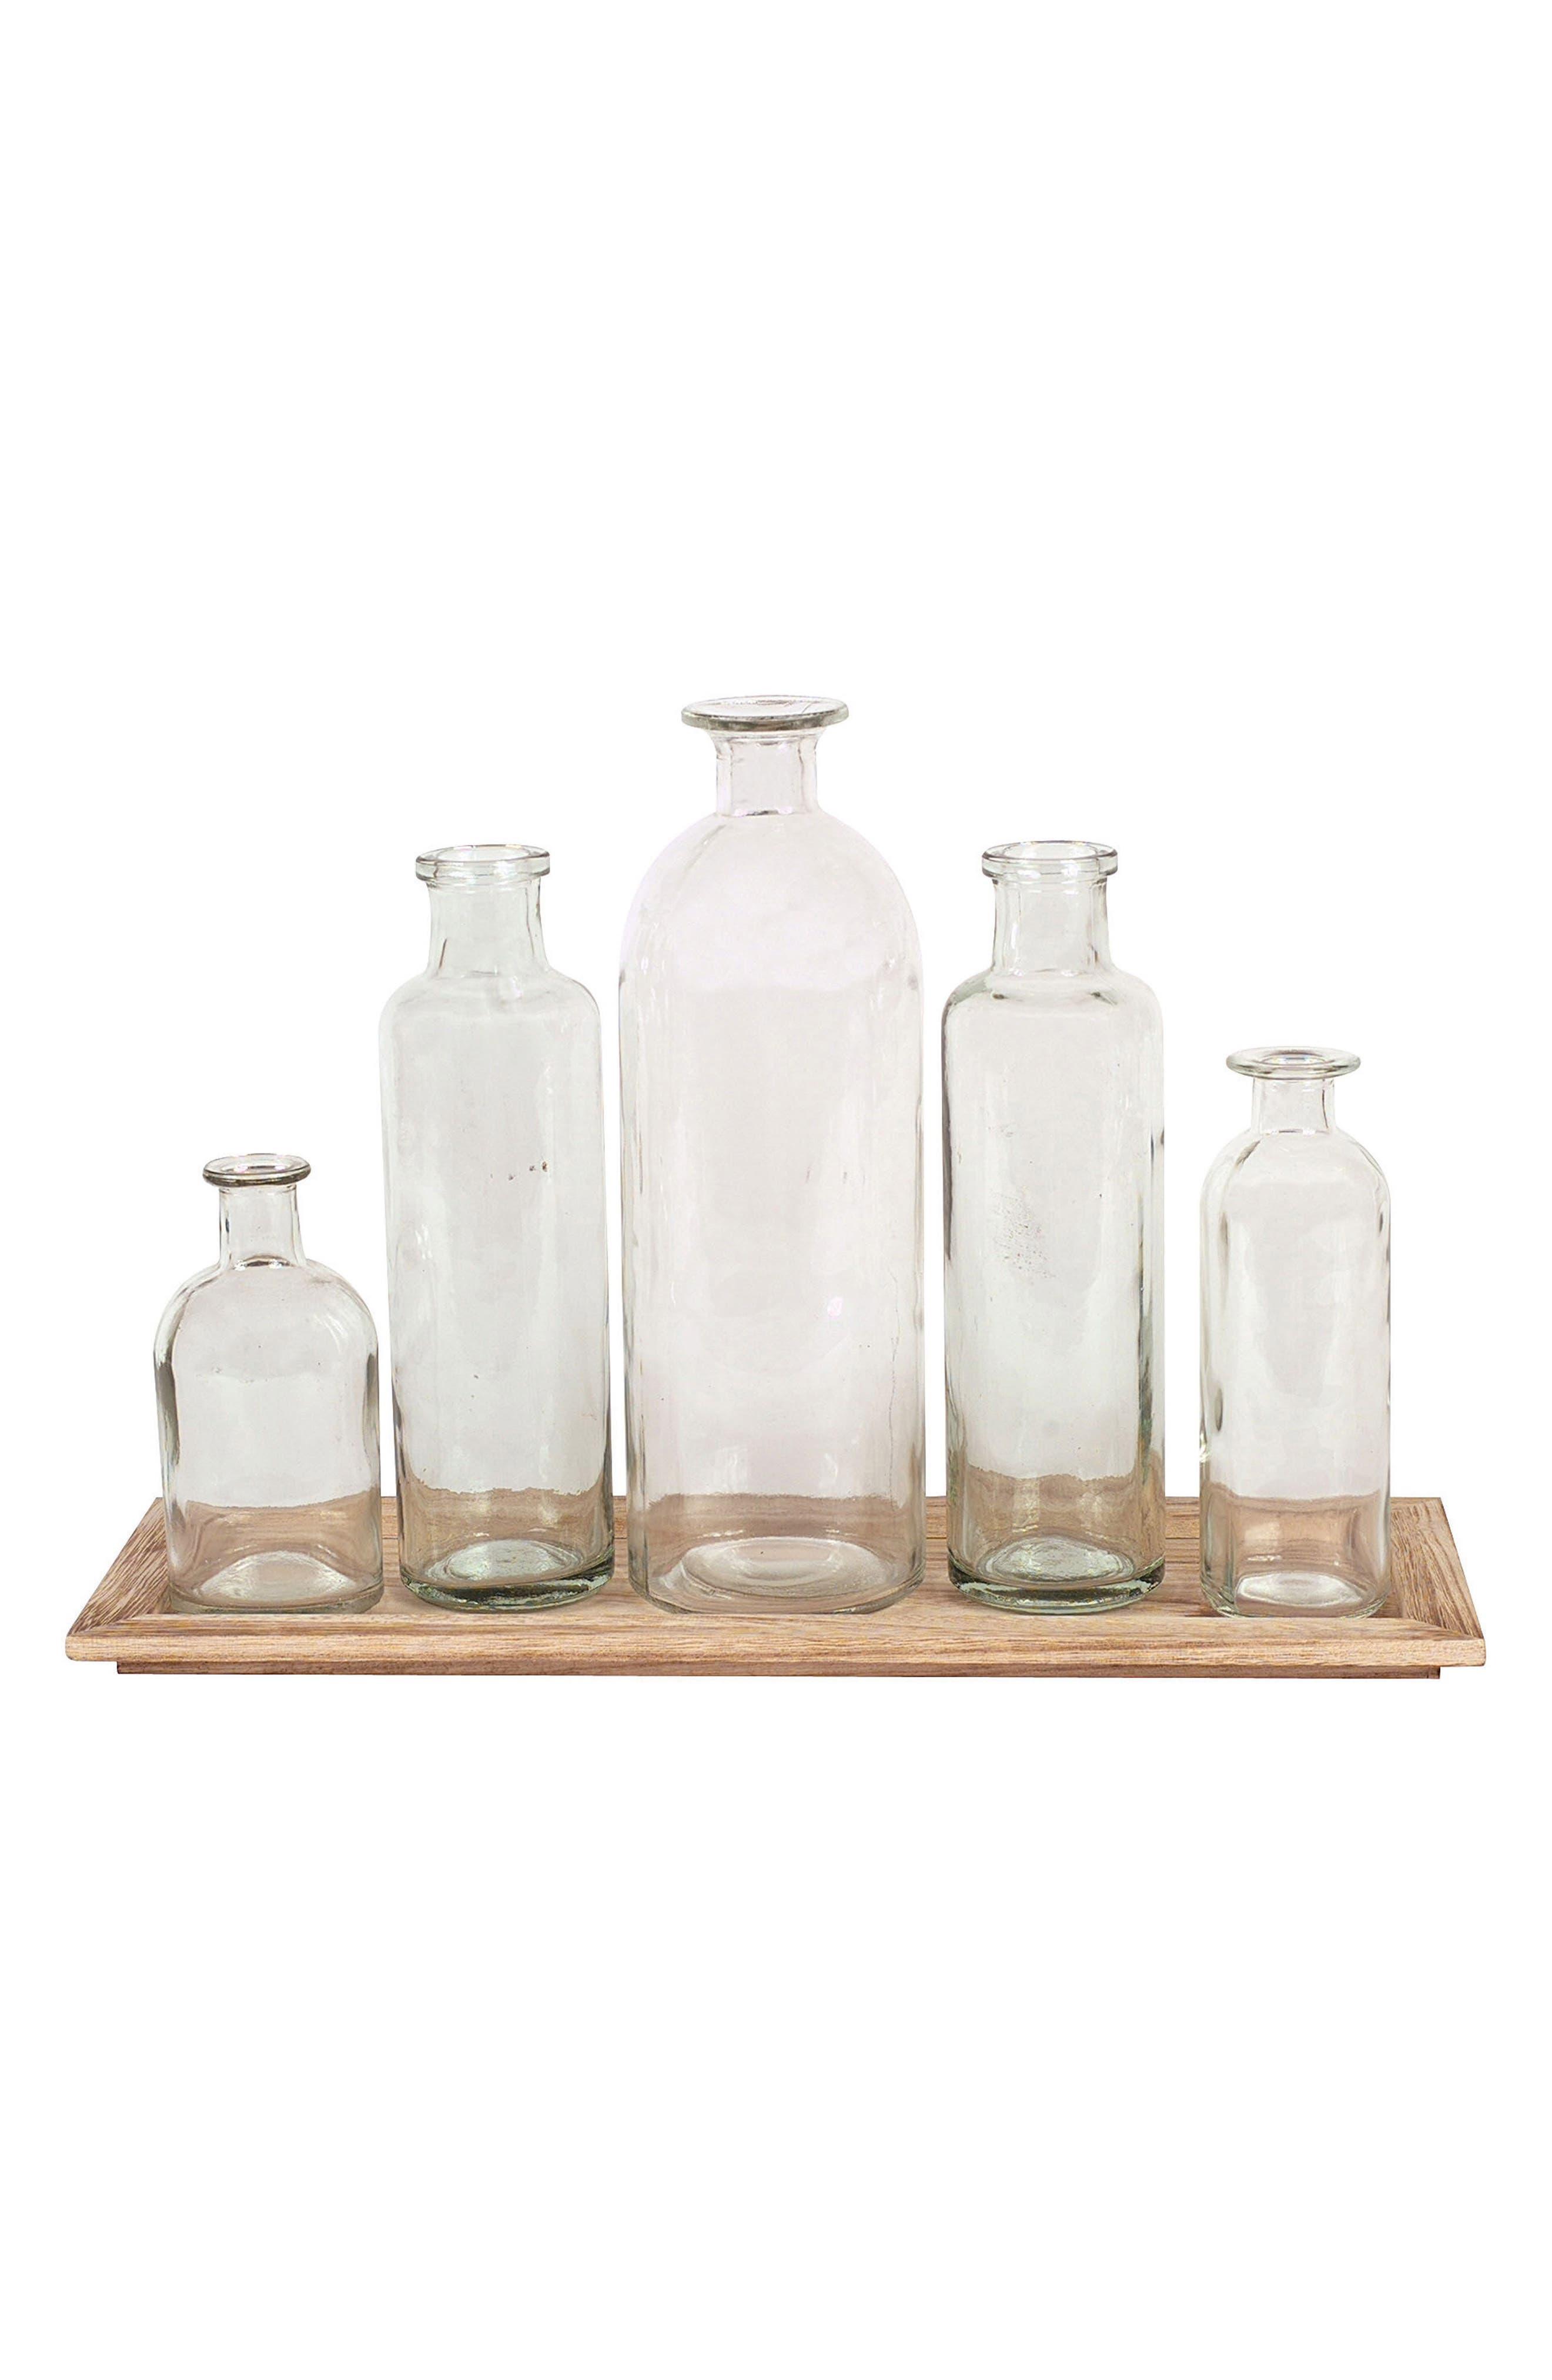 6-Piece Vase & Tray Set,                             Main thumbnail 1, color,                             Brown